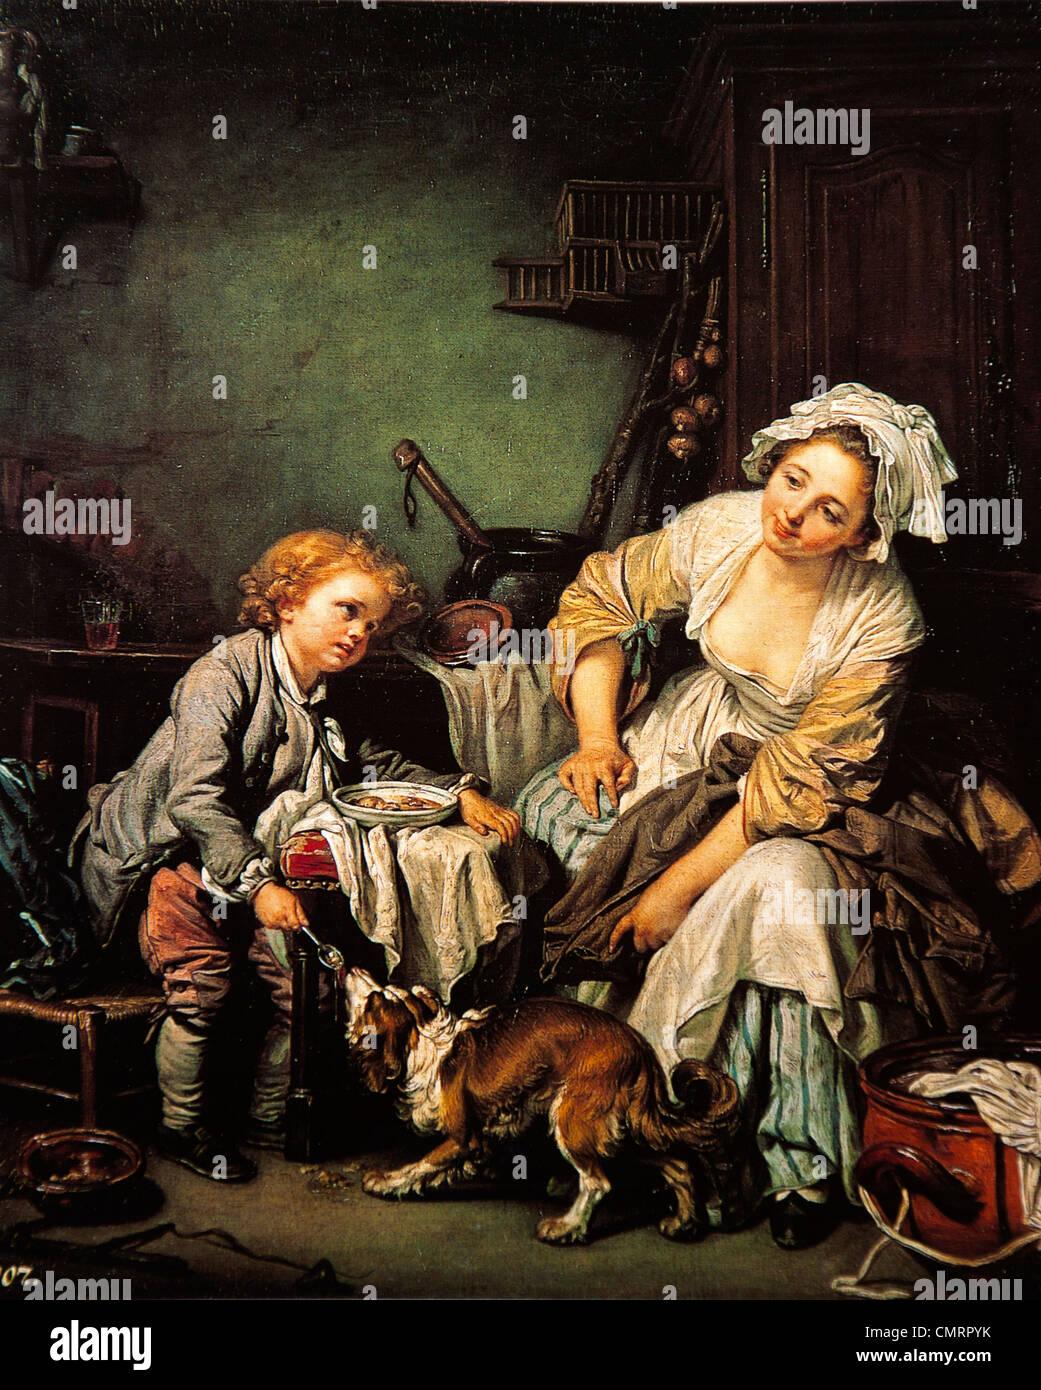 Jean-Baptiste Greuze, The Spoiled Child - Stock Image